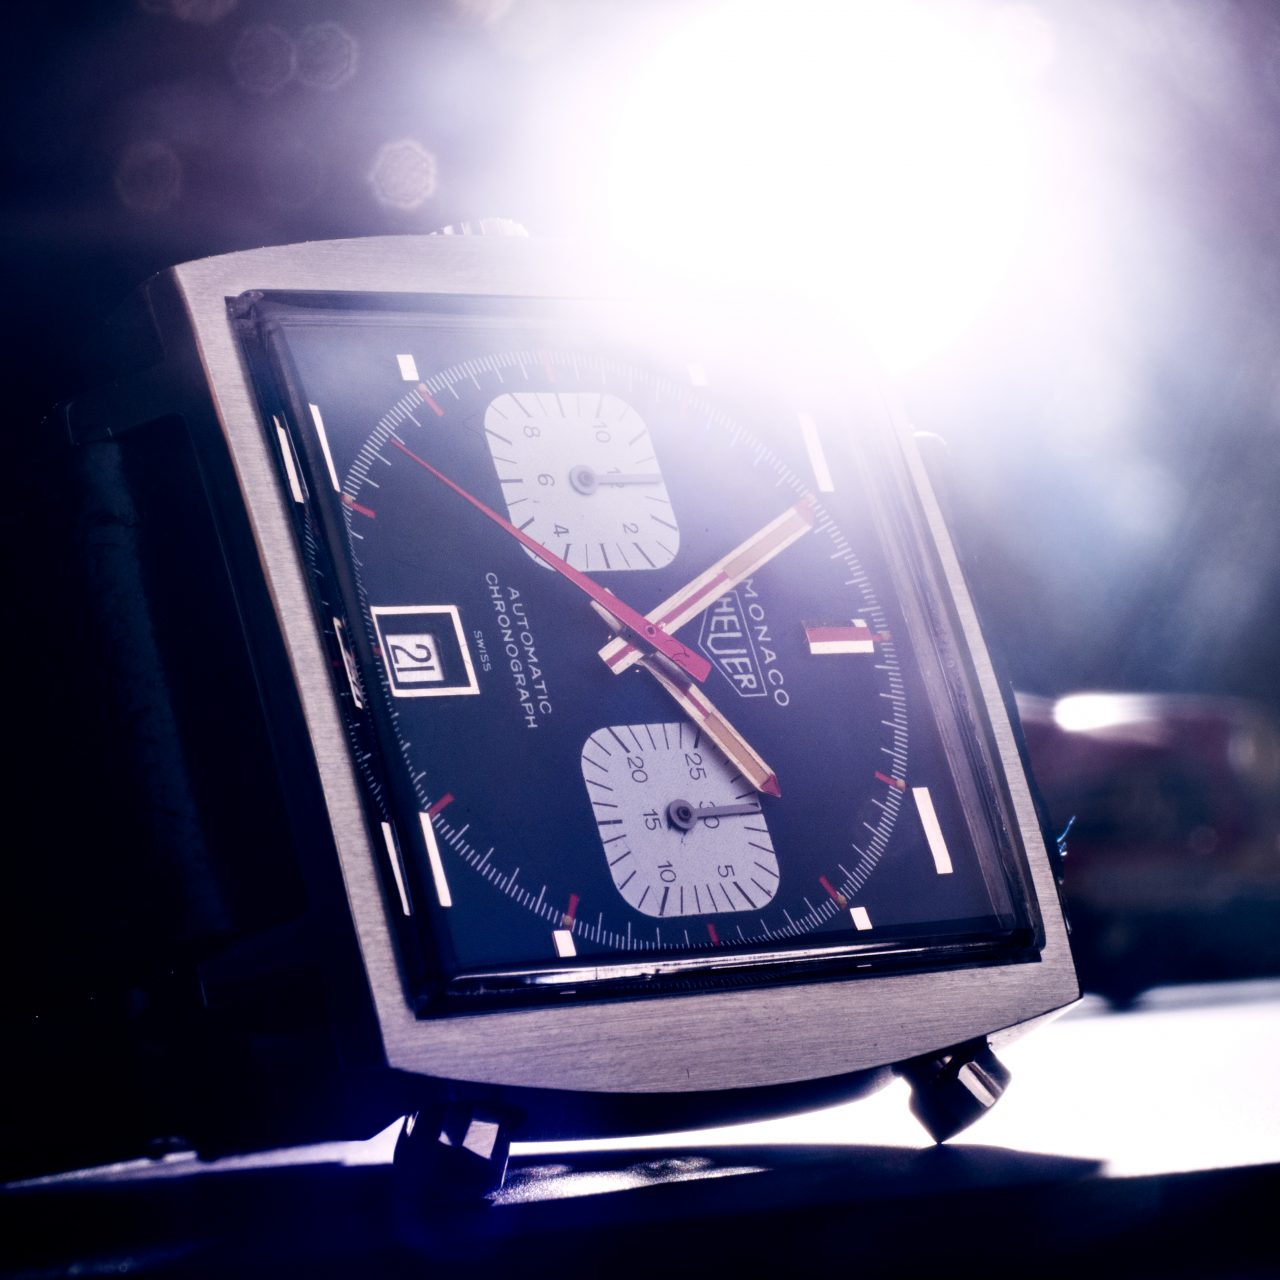 Heuer Monaco Glow Watches of Lancashire